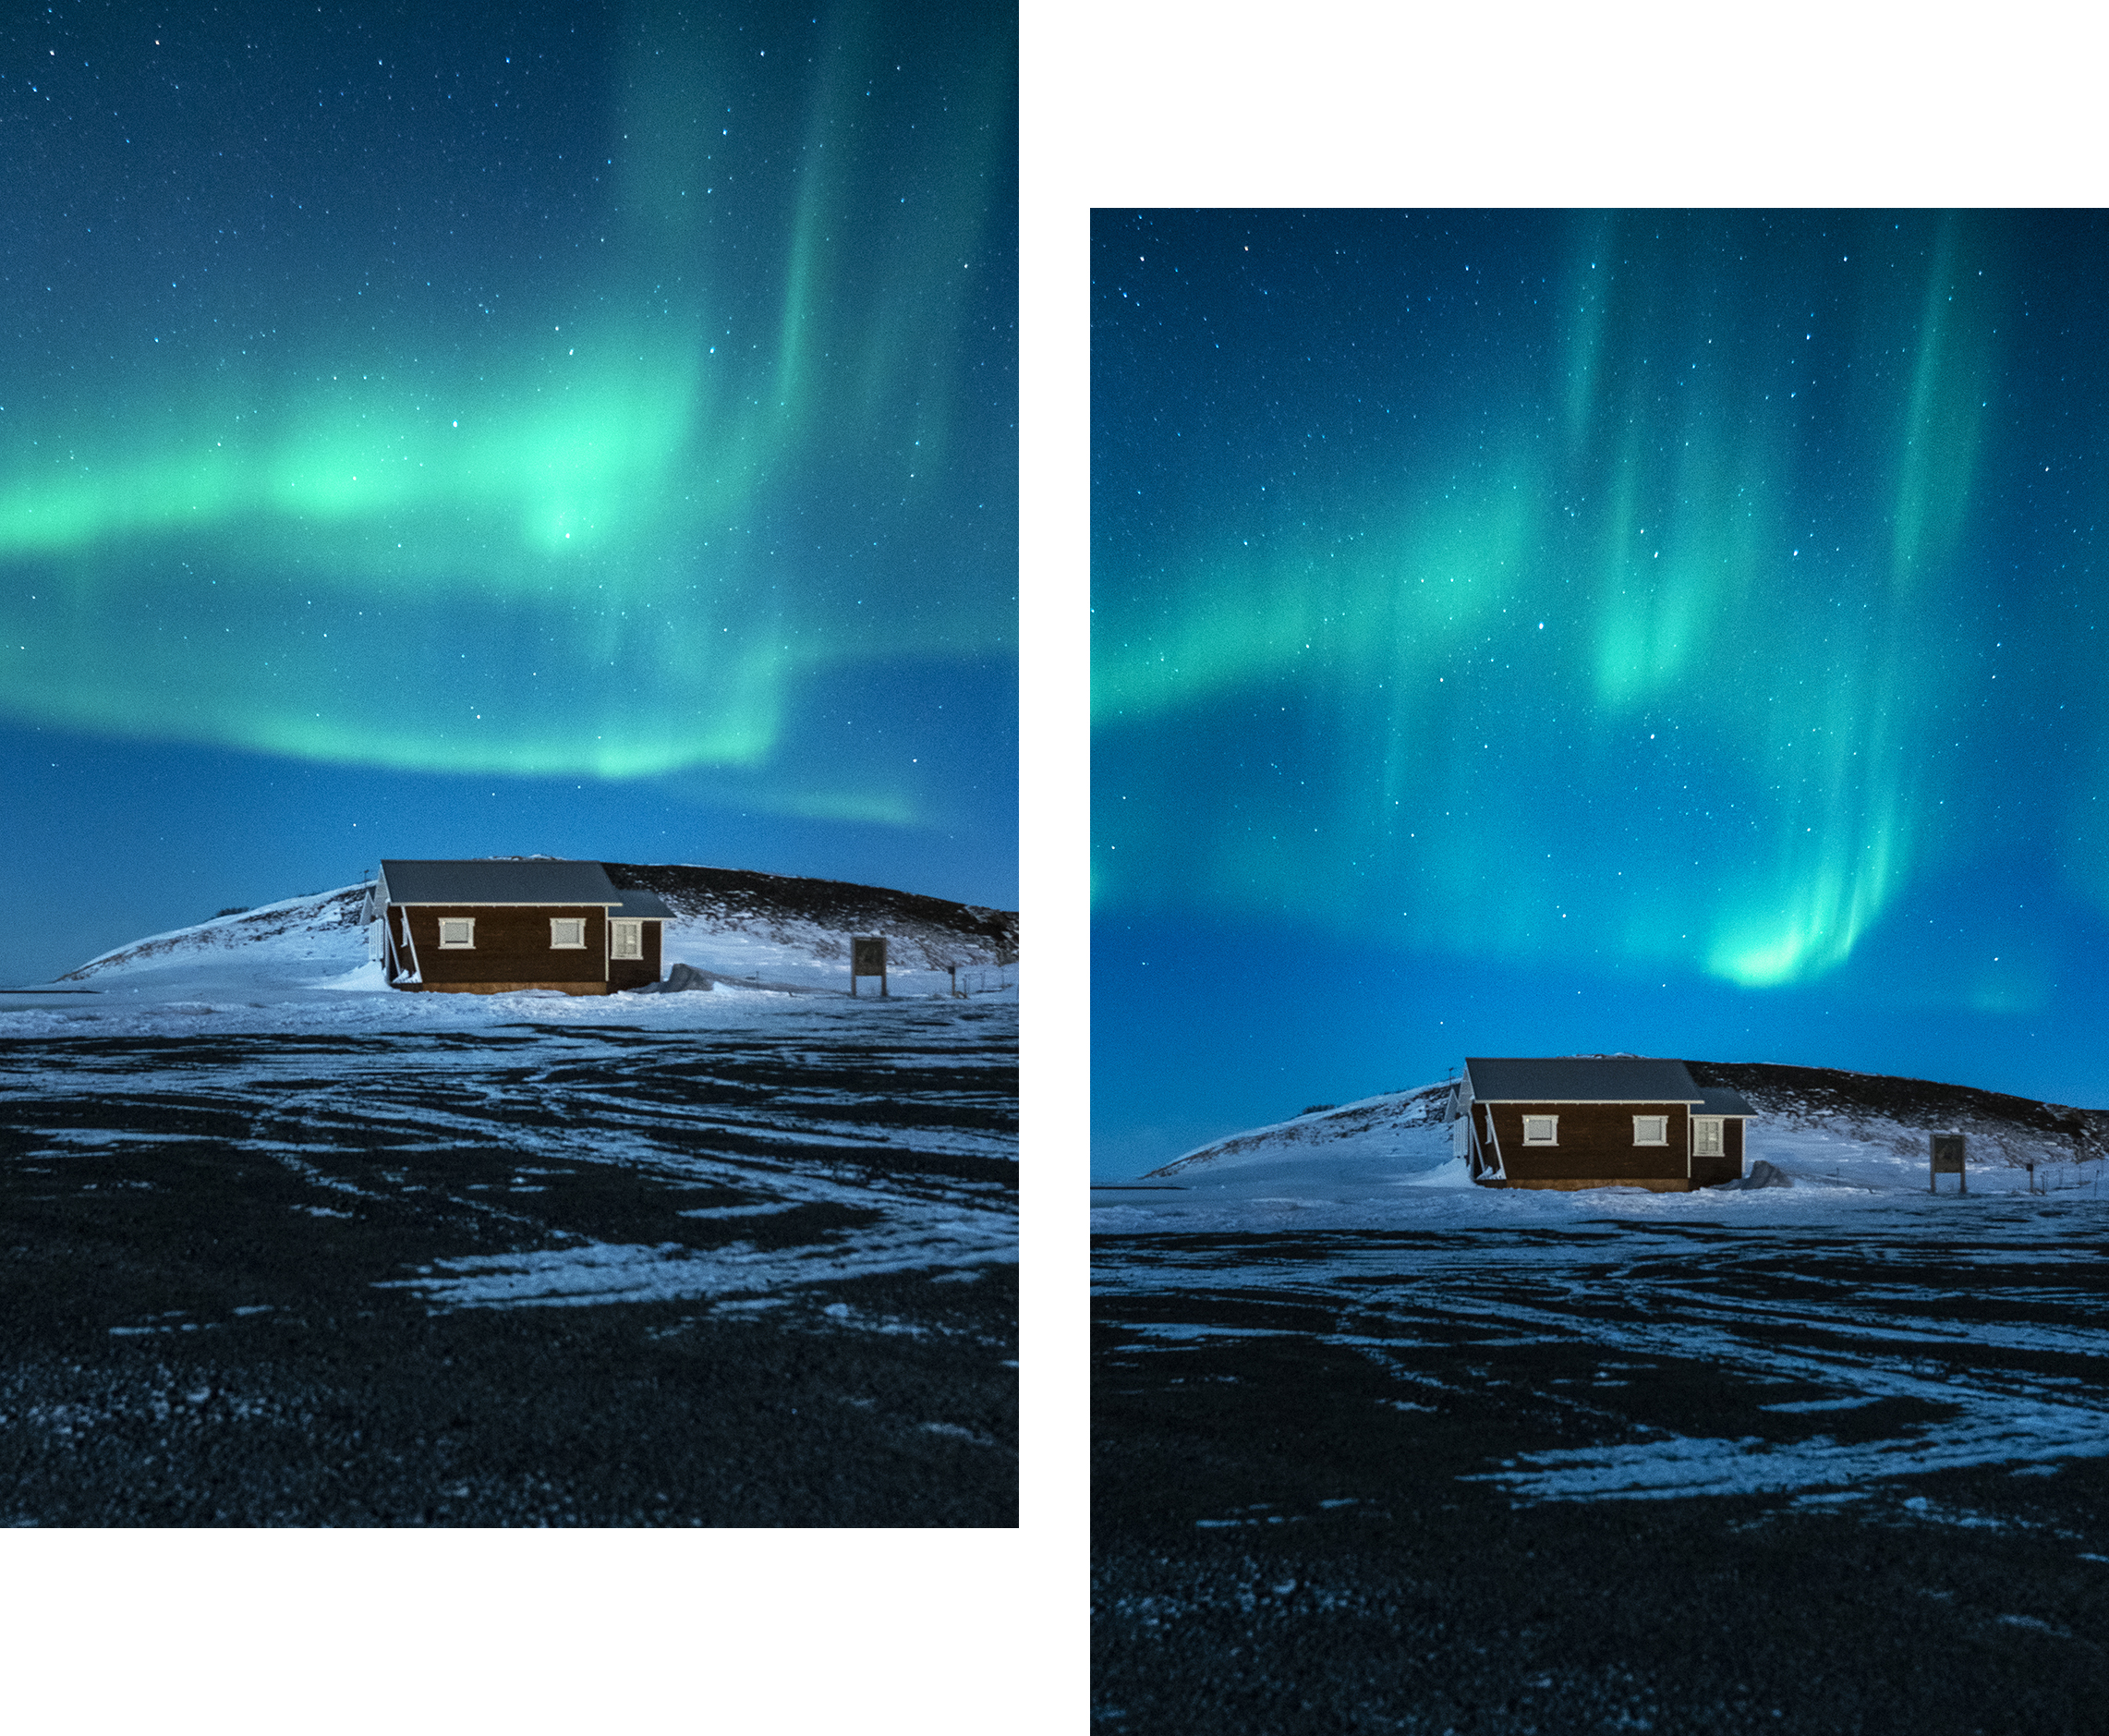 Islande cabane neige aurores boréales